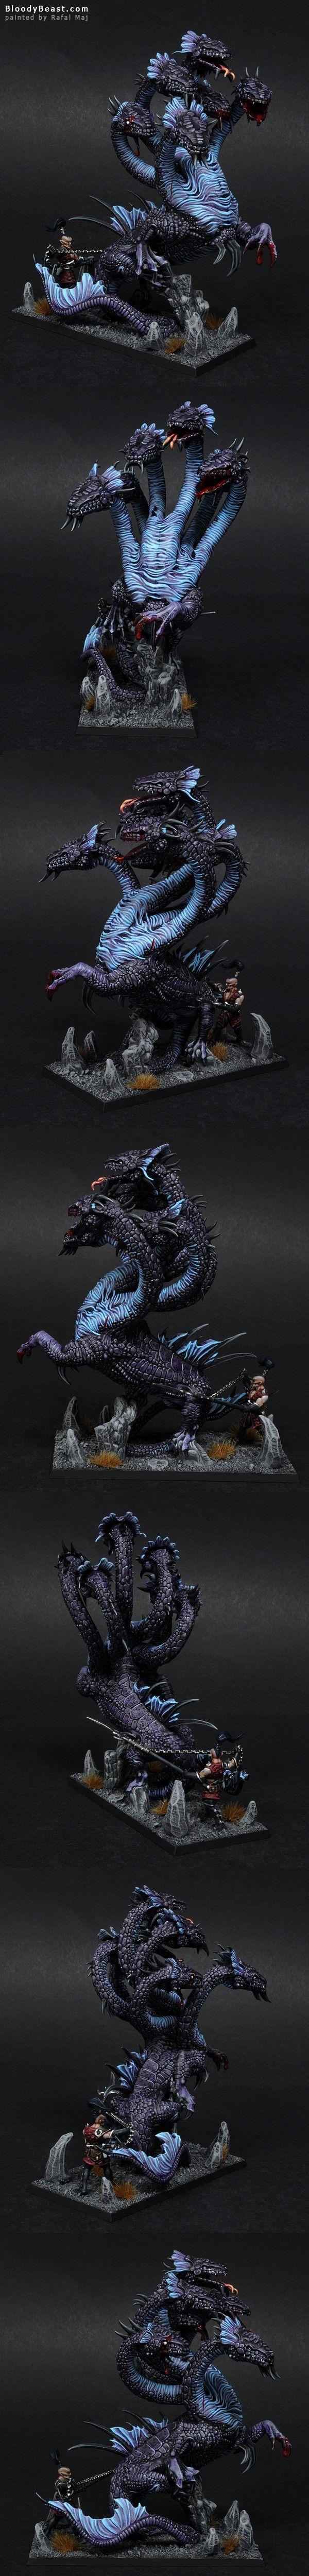 Dark Elves War Hydra - BloodyBeast.com